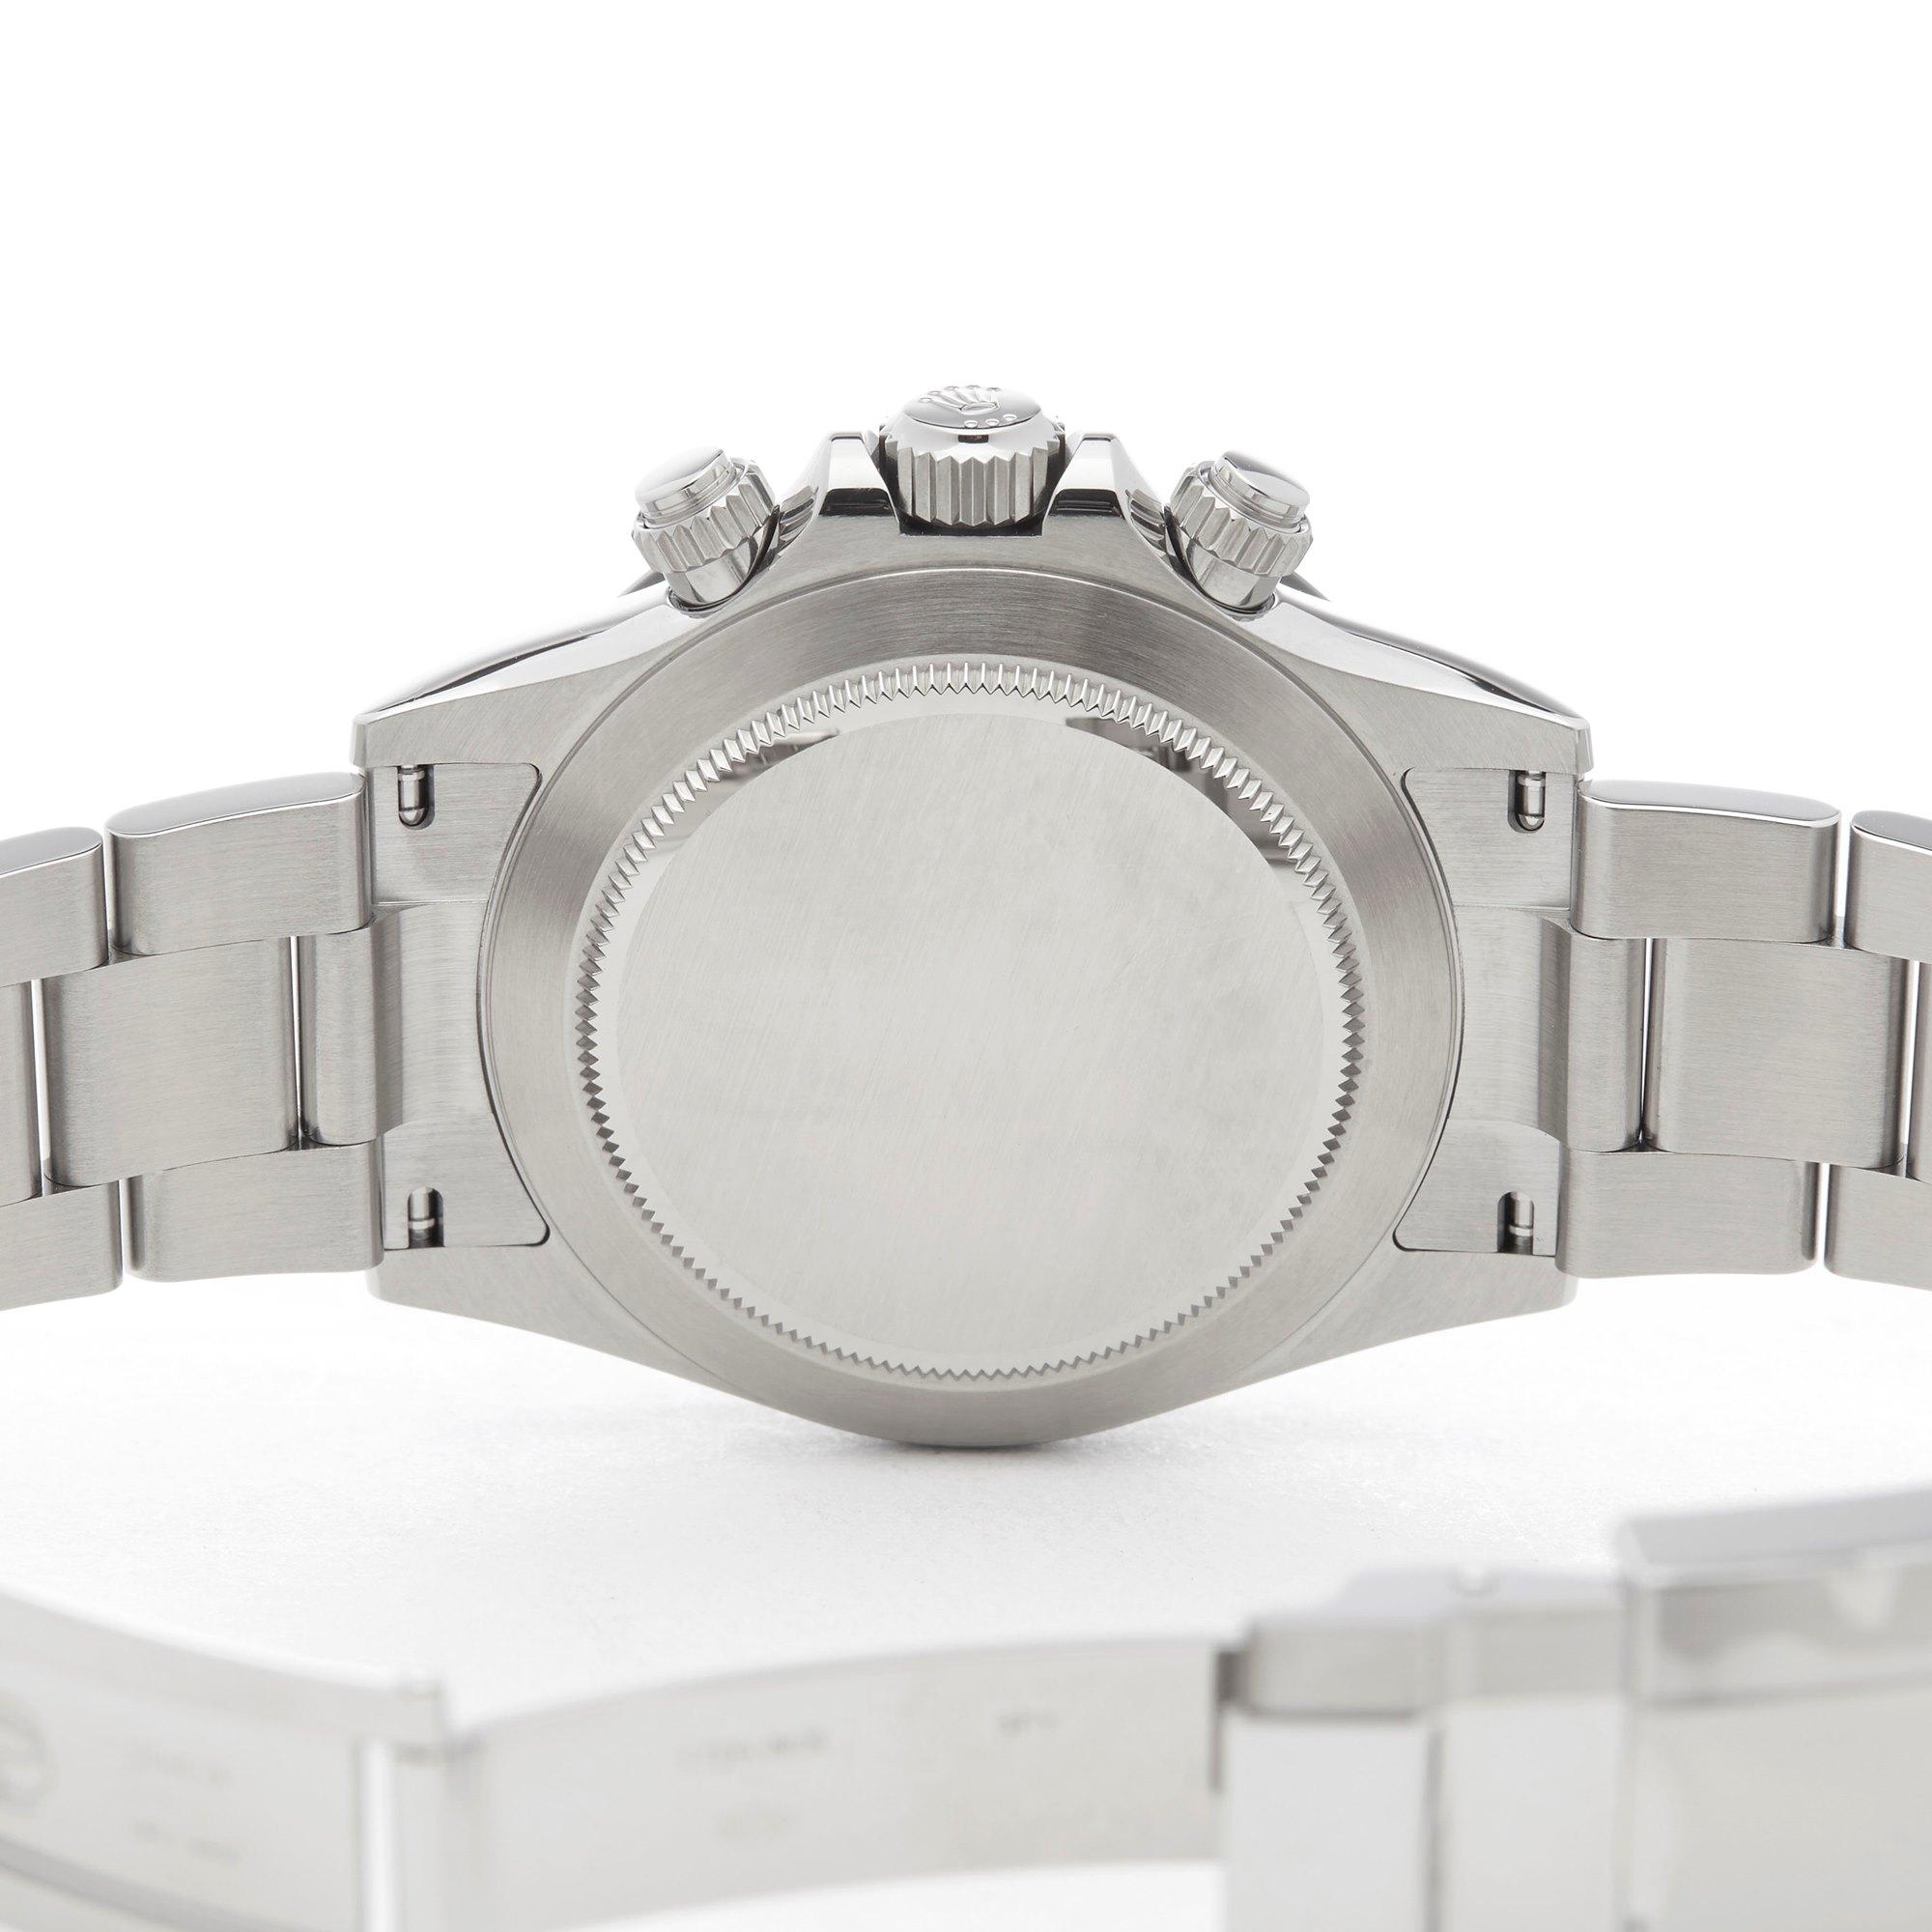 Rolex Daytona Chronograph Stickered Stainless Steel 116500LN